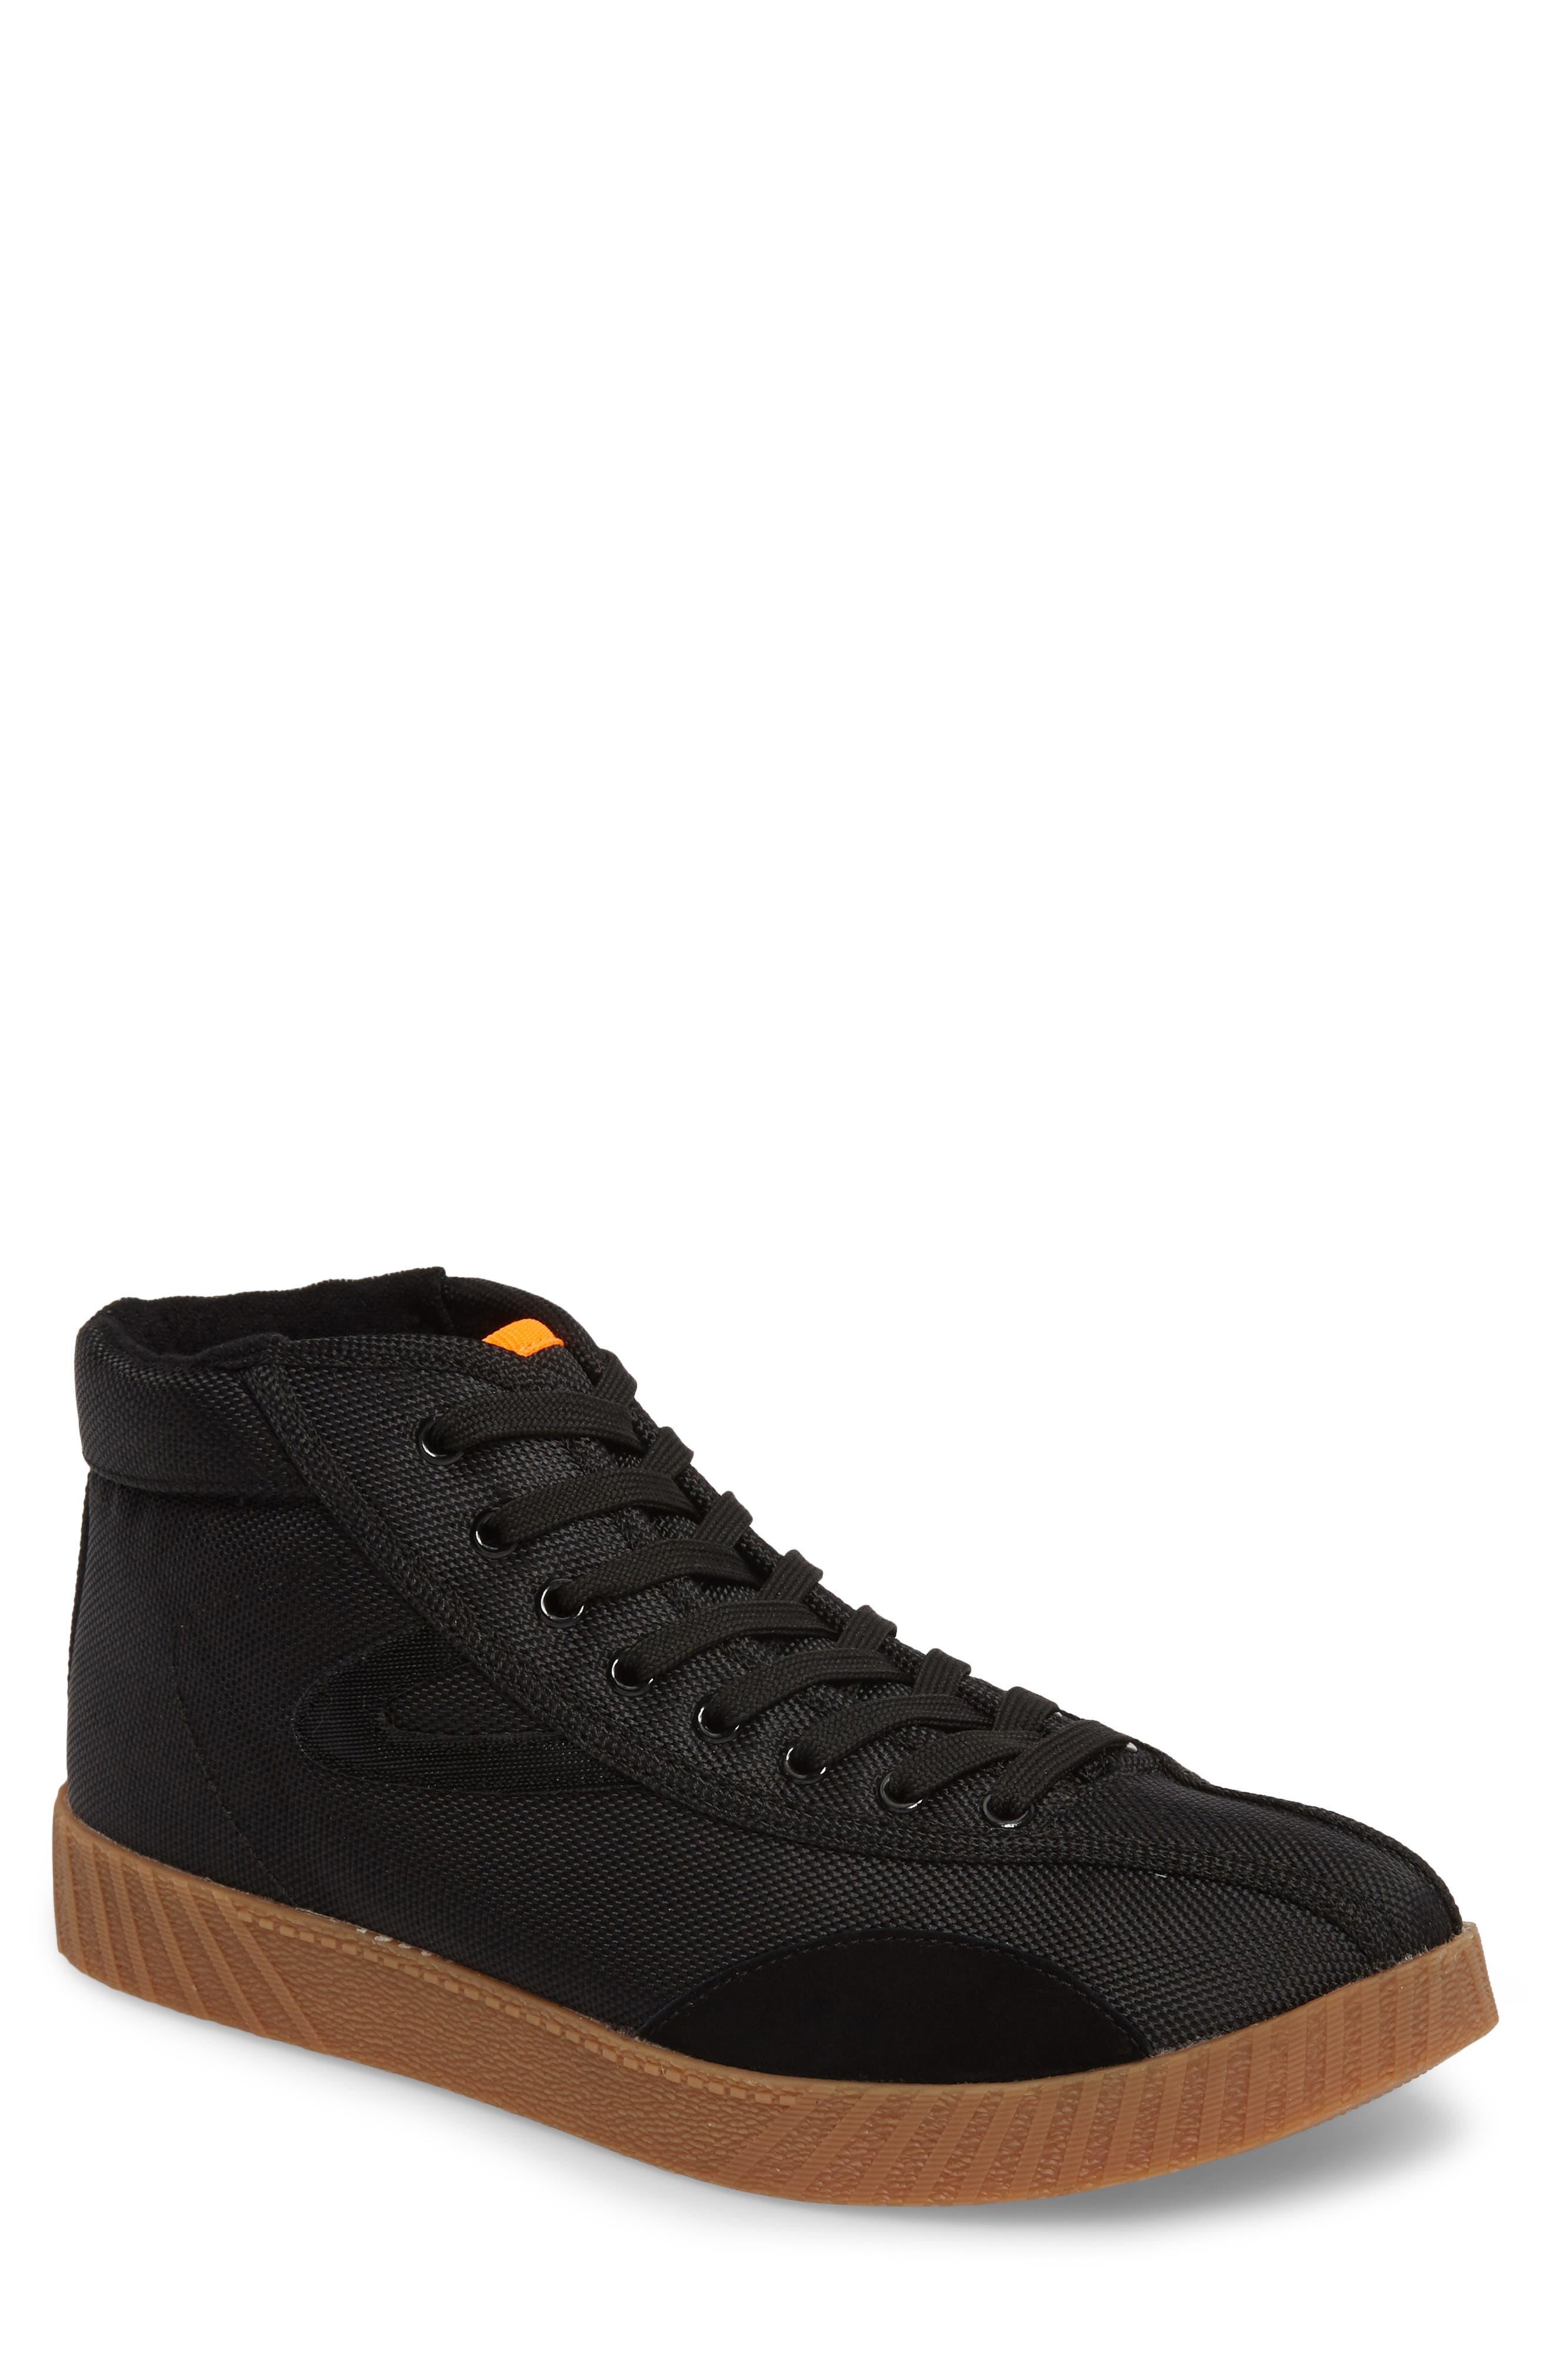 Andre 3000 Nylite High Top Sneaker,                         Main,                         color, Black/ Neon Orange Nylon